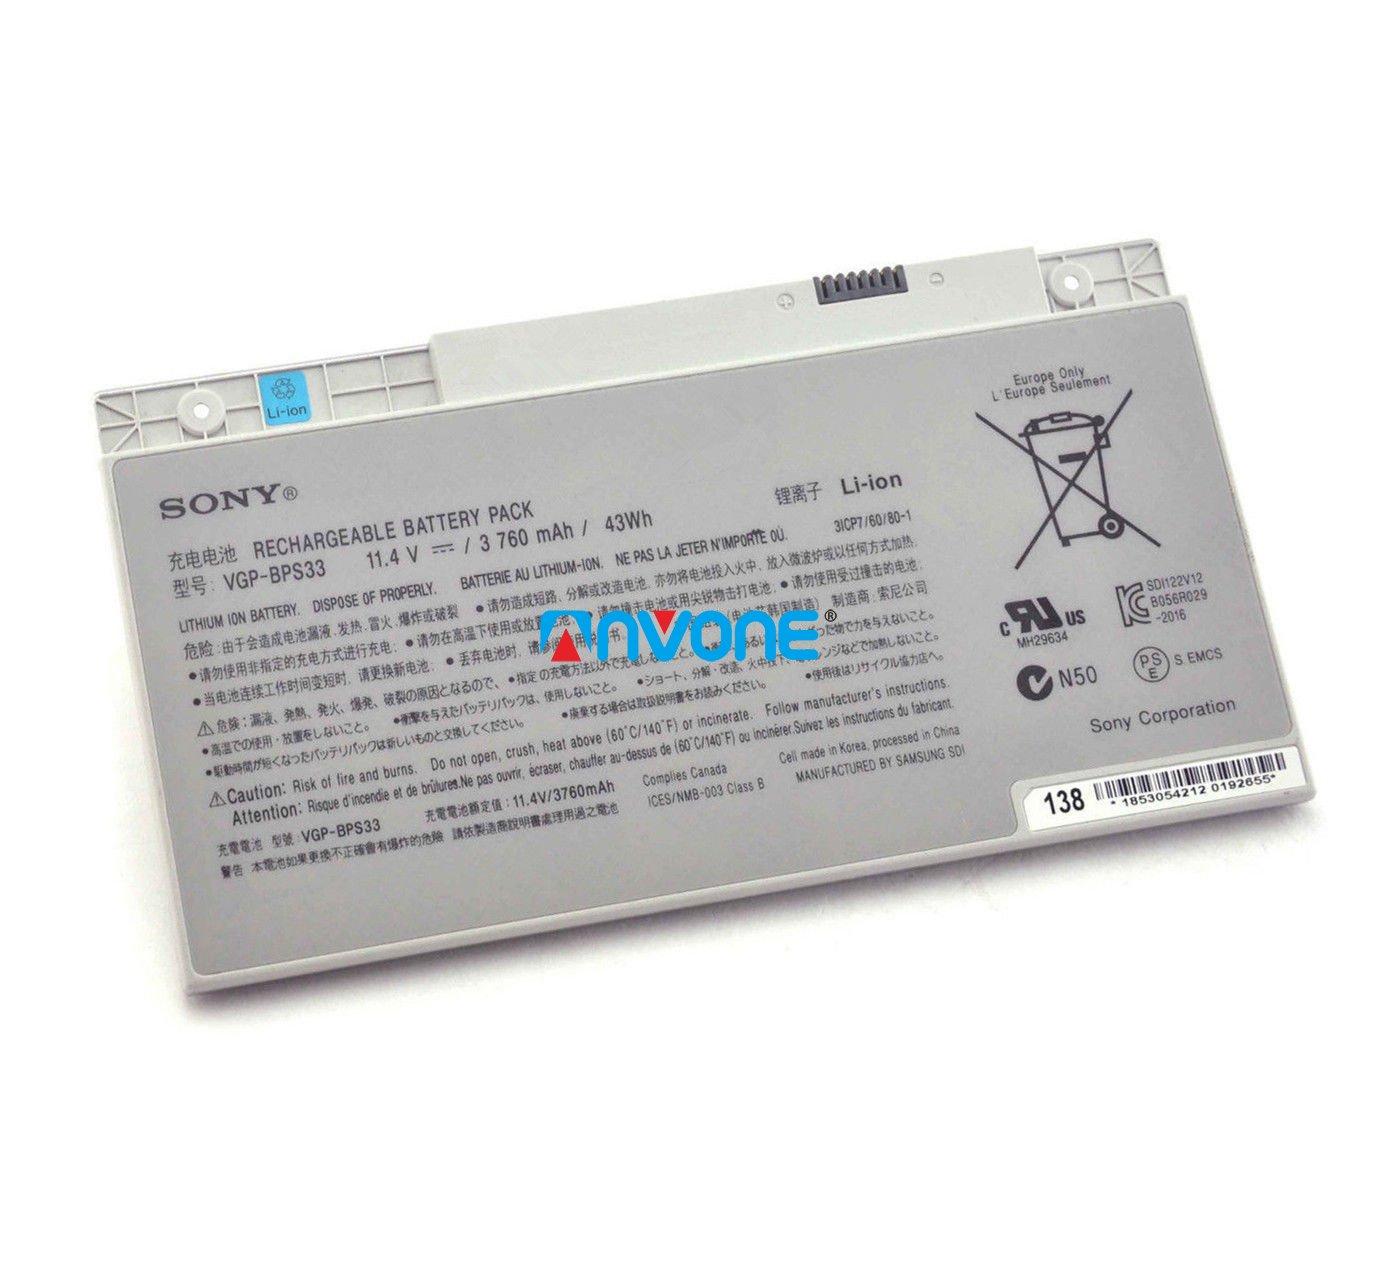 VGP-BPS33 Battery For Sony Vaio SVT-14 SVT-15 Vaio T14 T15